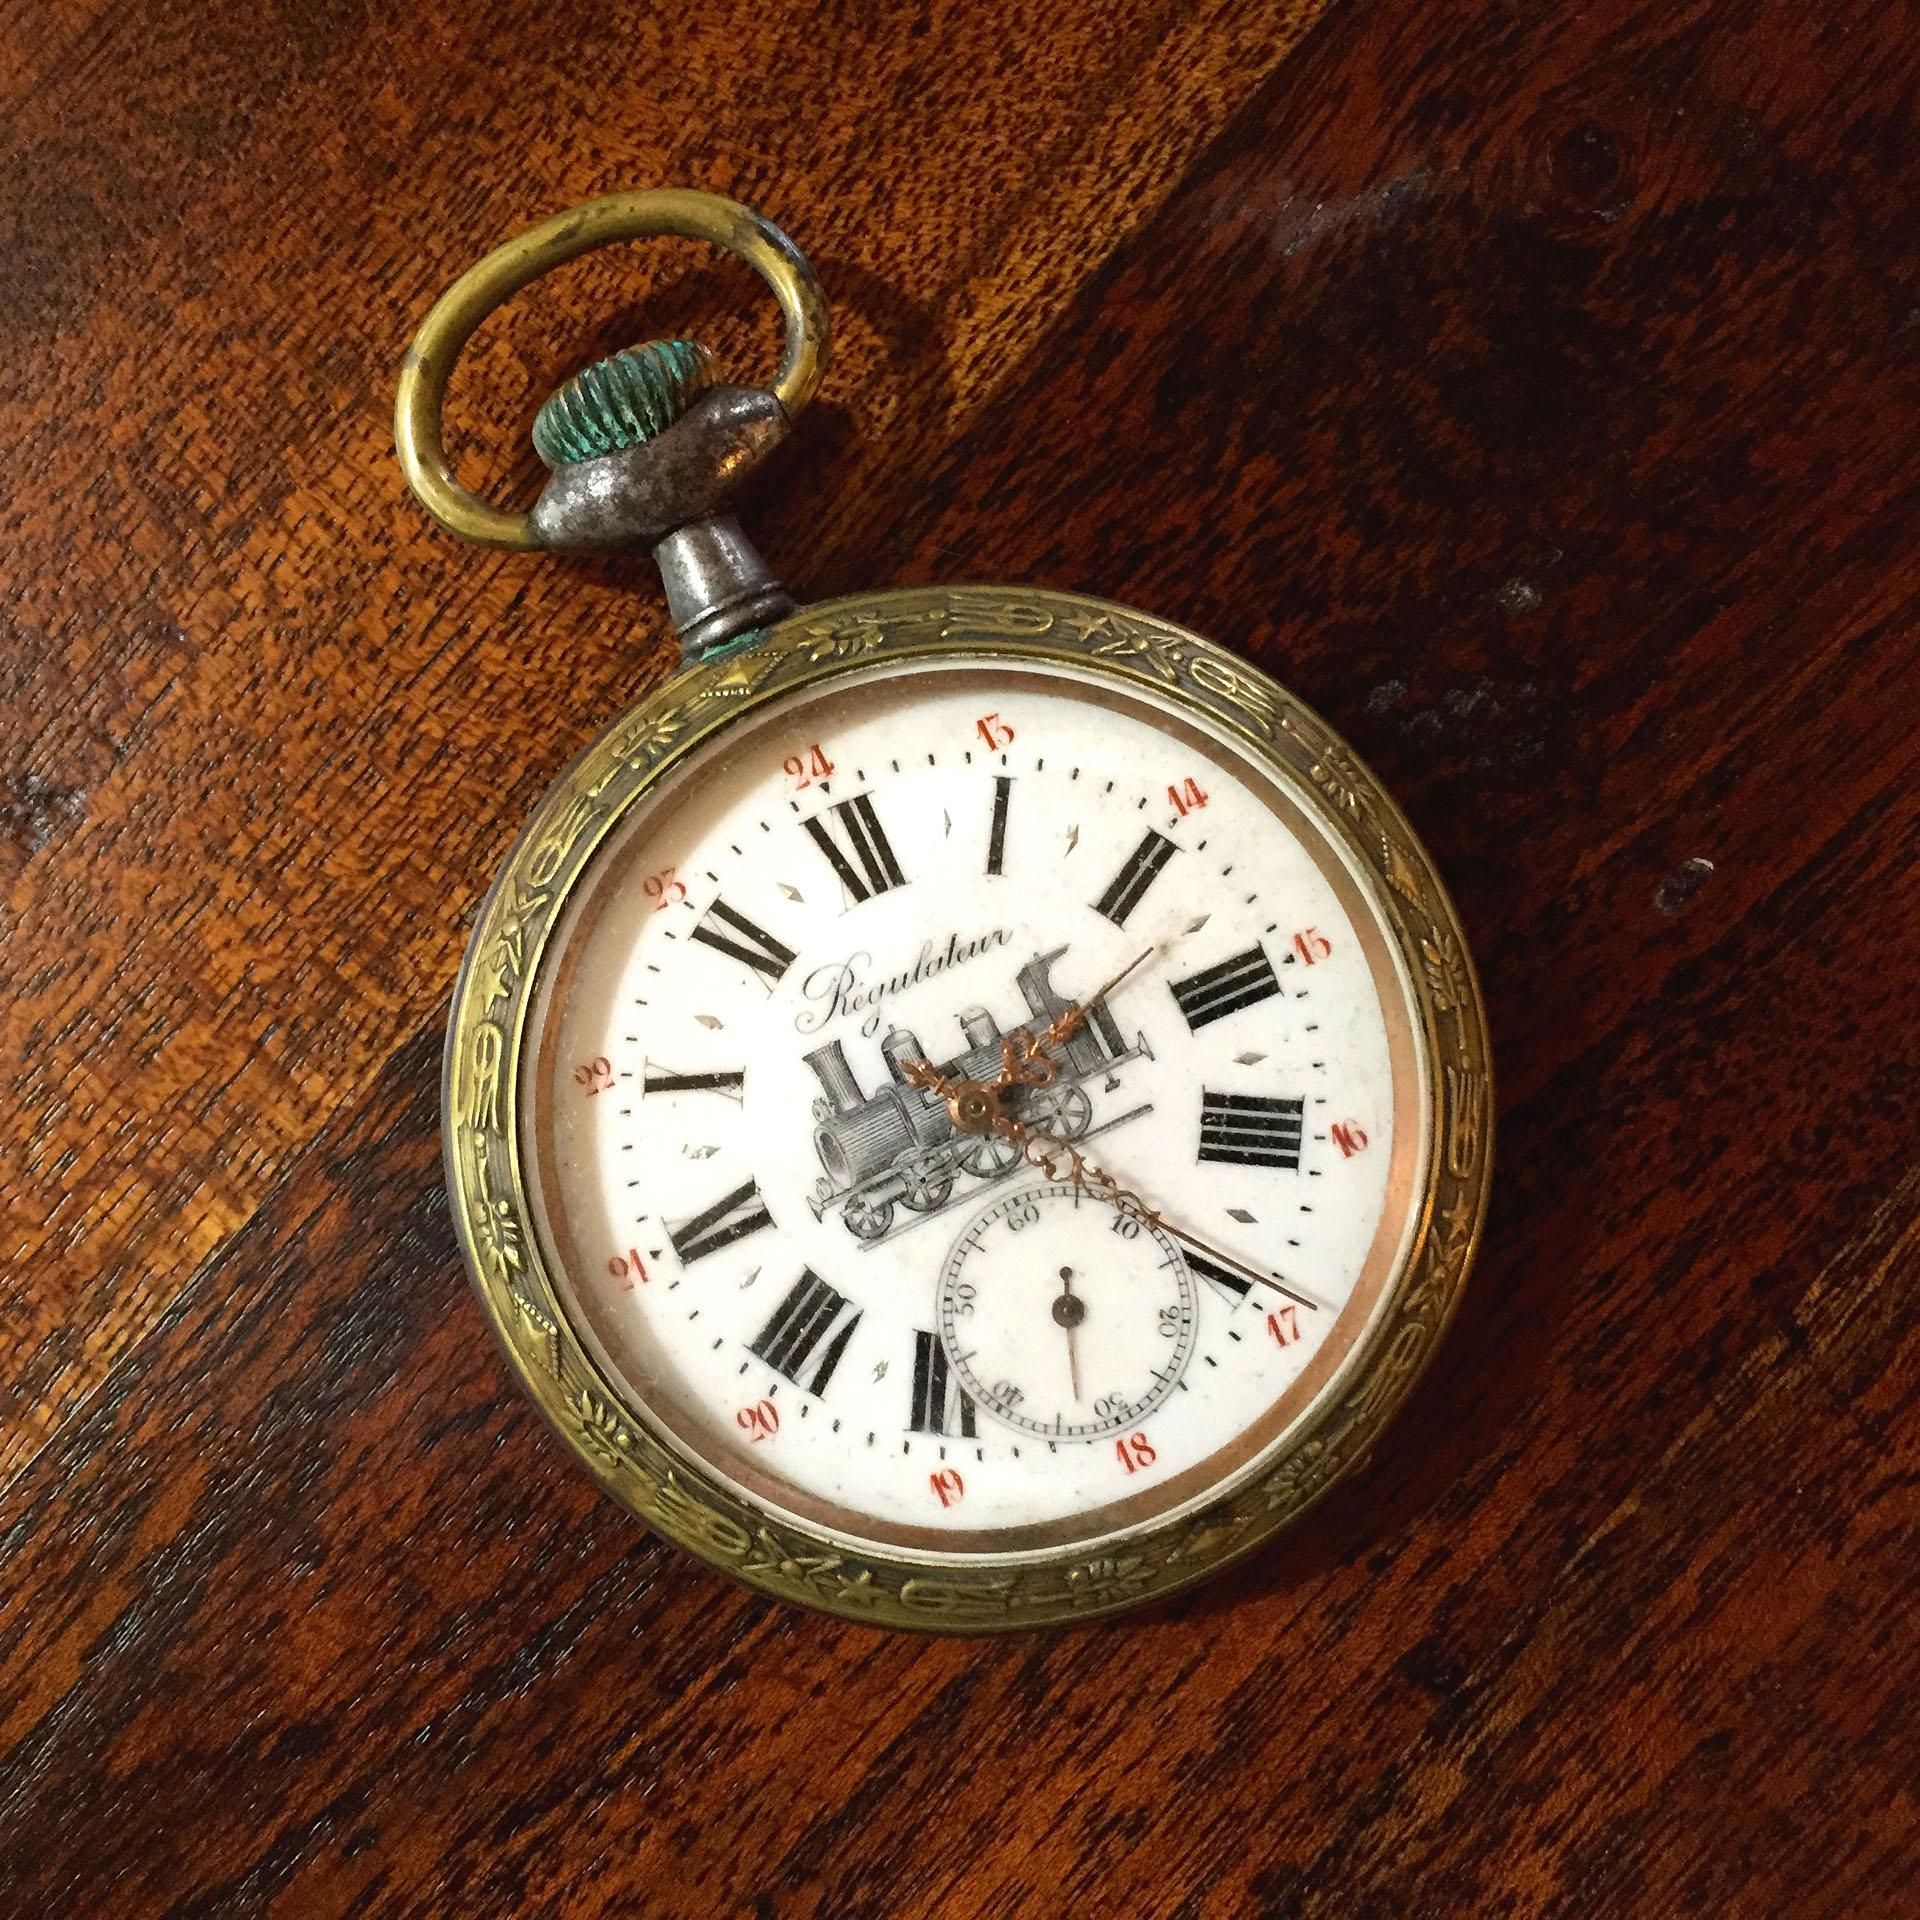 French regulateur pocket watch